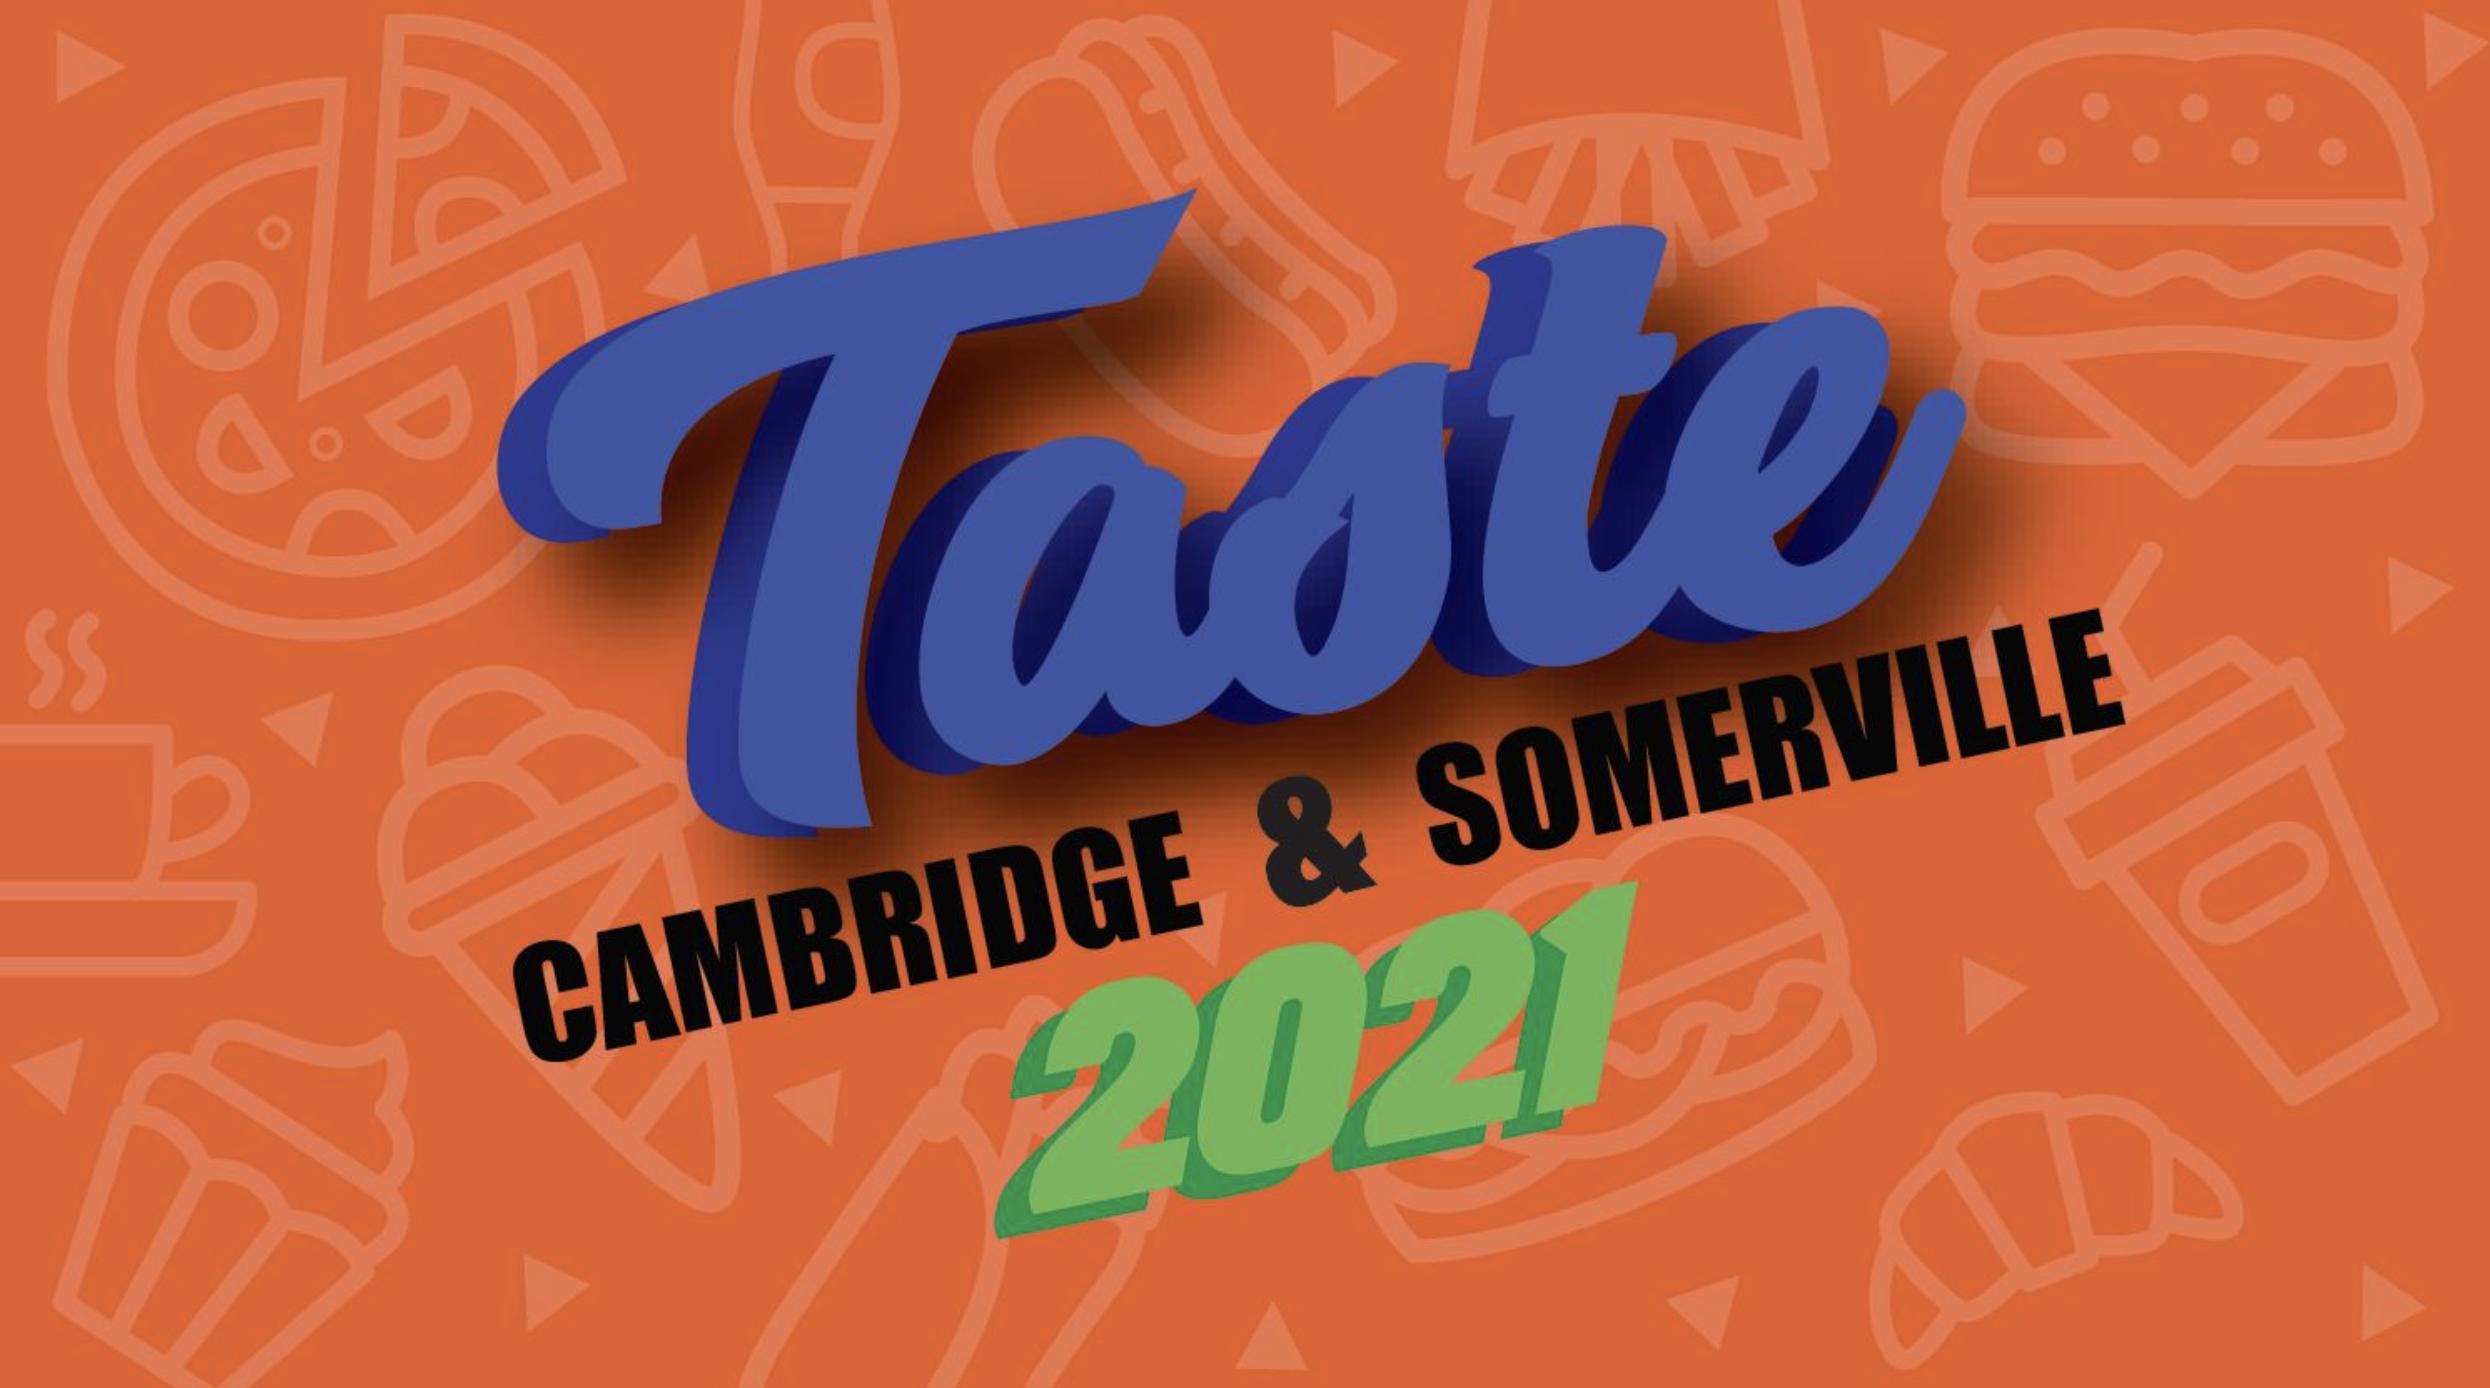 The Taste of Cambridge & Somerville